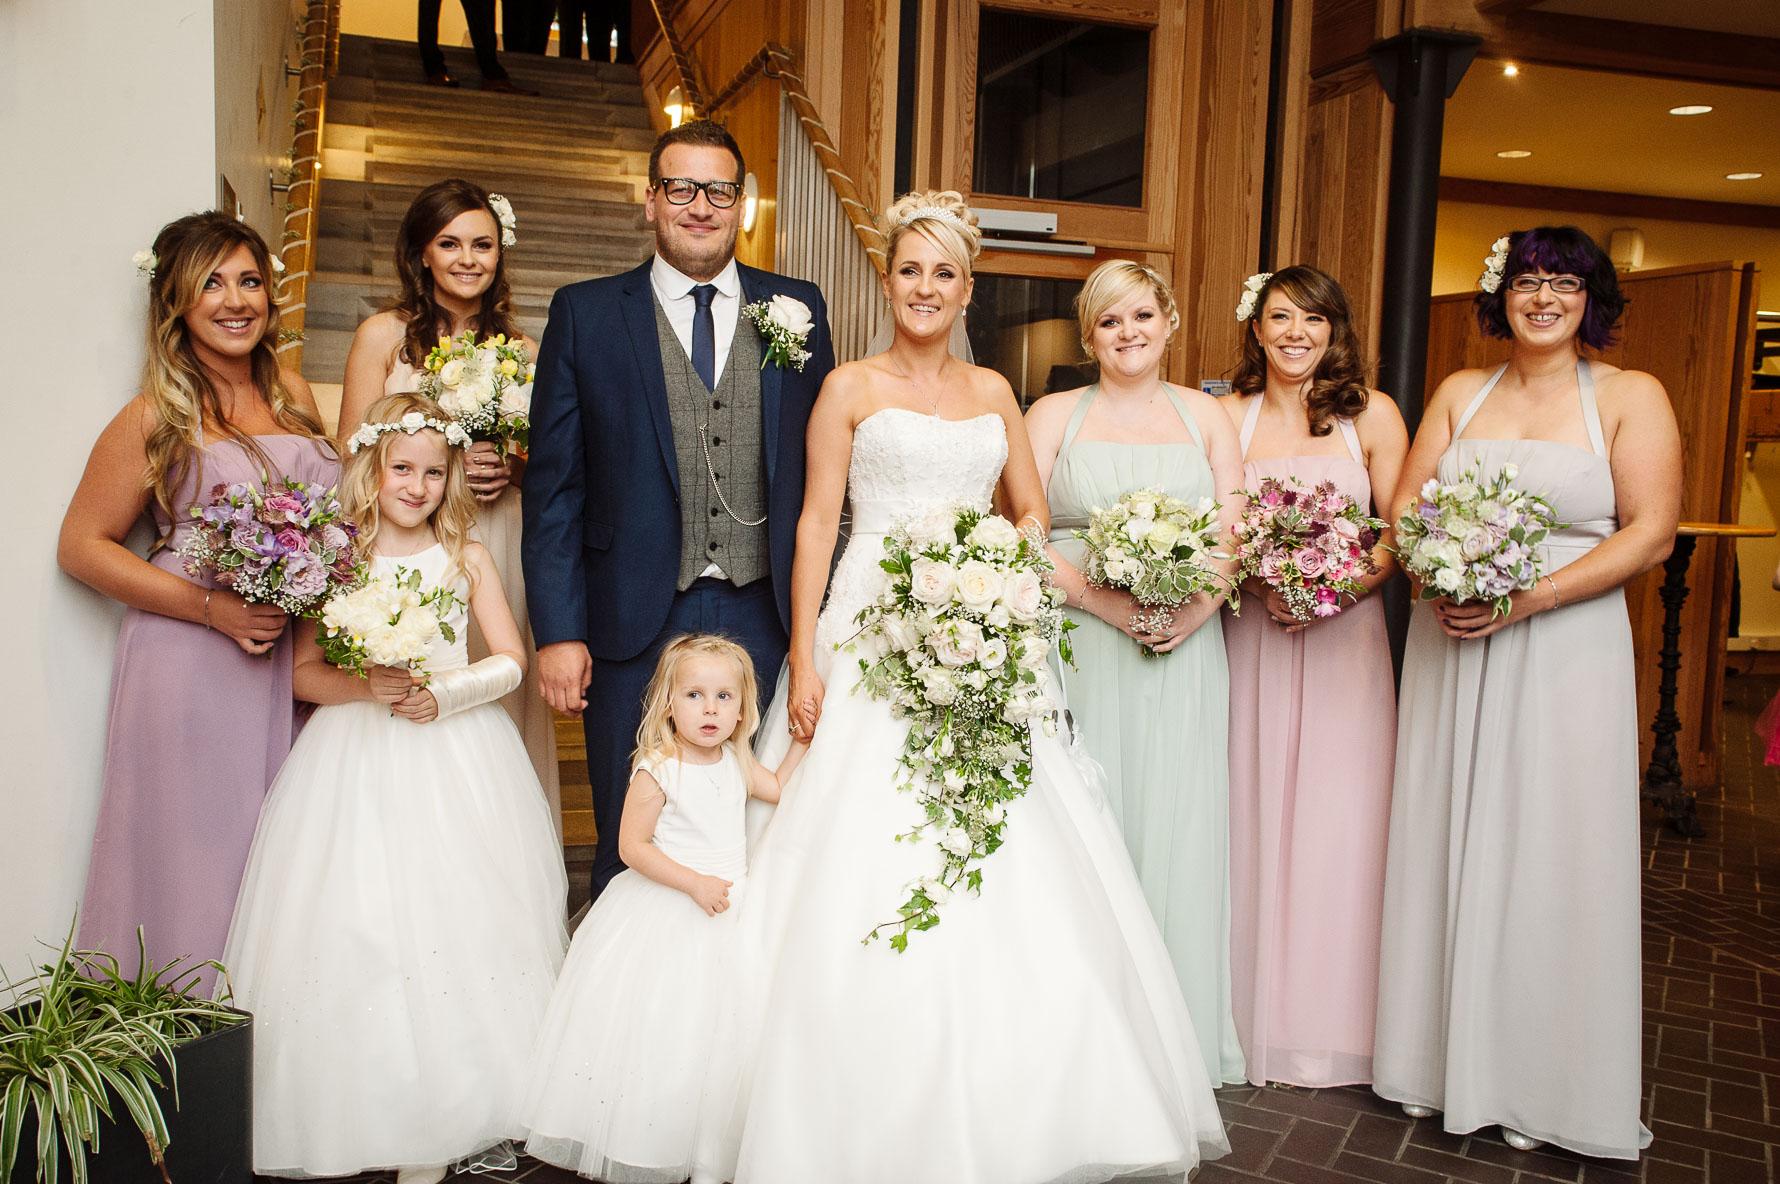 Canterbury Cathedral Lodge Wedding57-20141004 0918